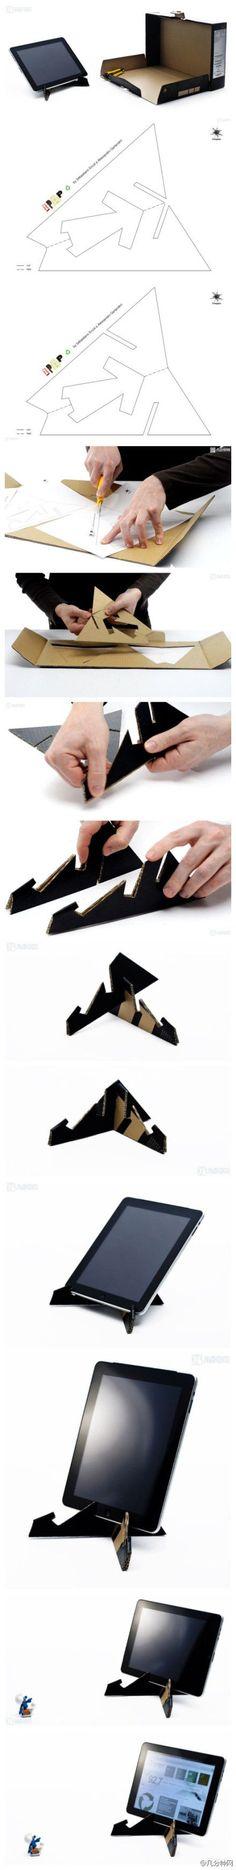 DIY-Cardboard-Tablet-Stand.jpeg (440×3488)